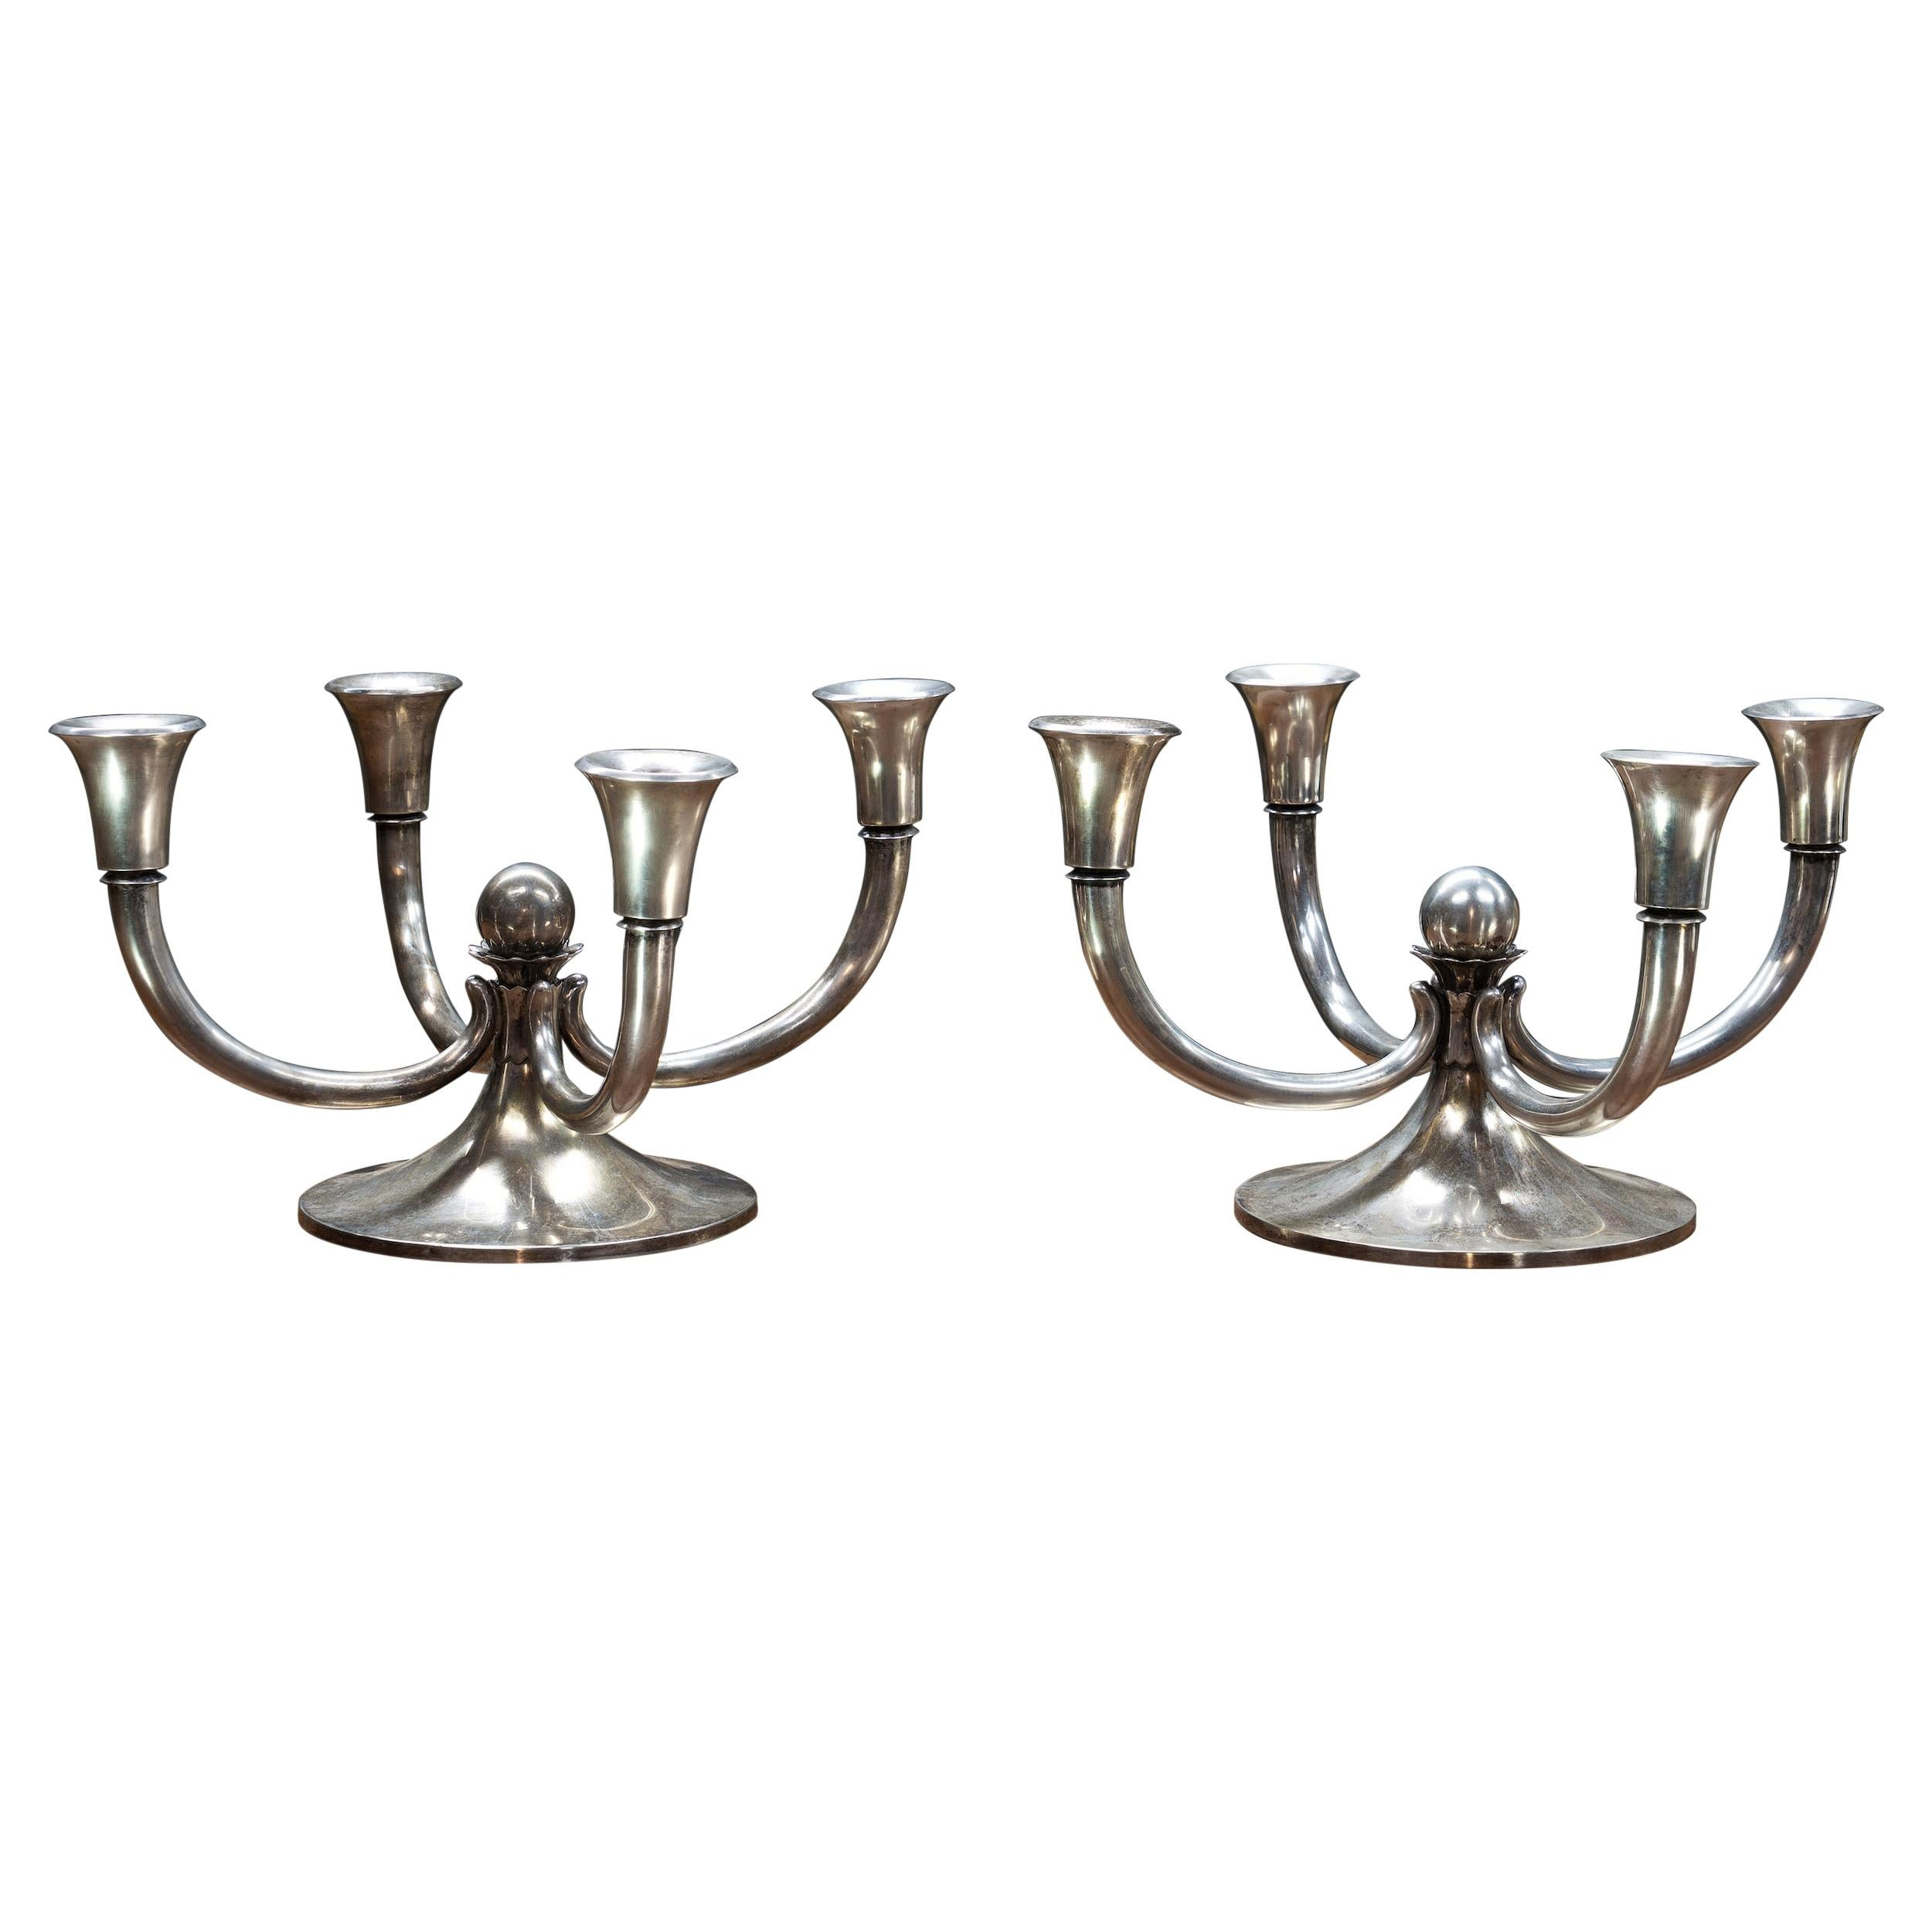 1960s Midcentury Georg Jensen Style Sterling Candelabras Candleholders